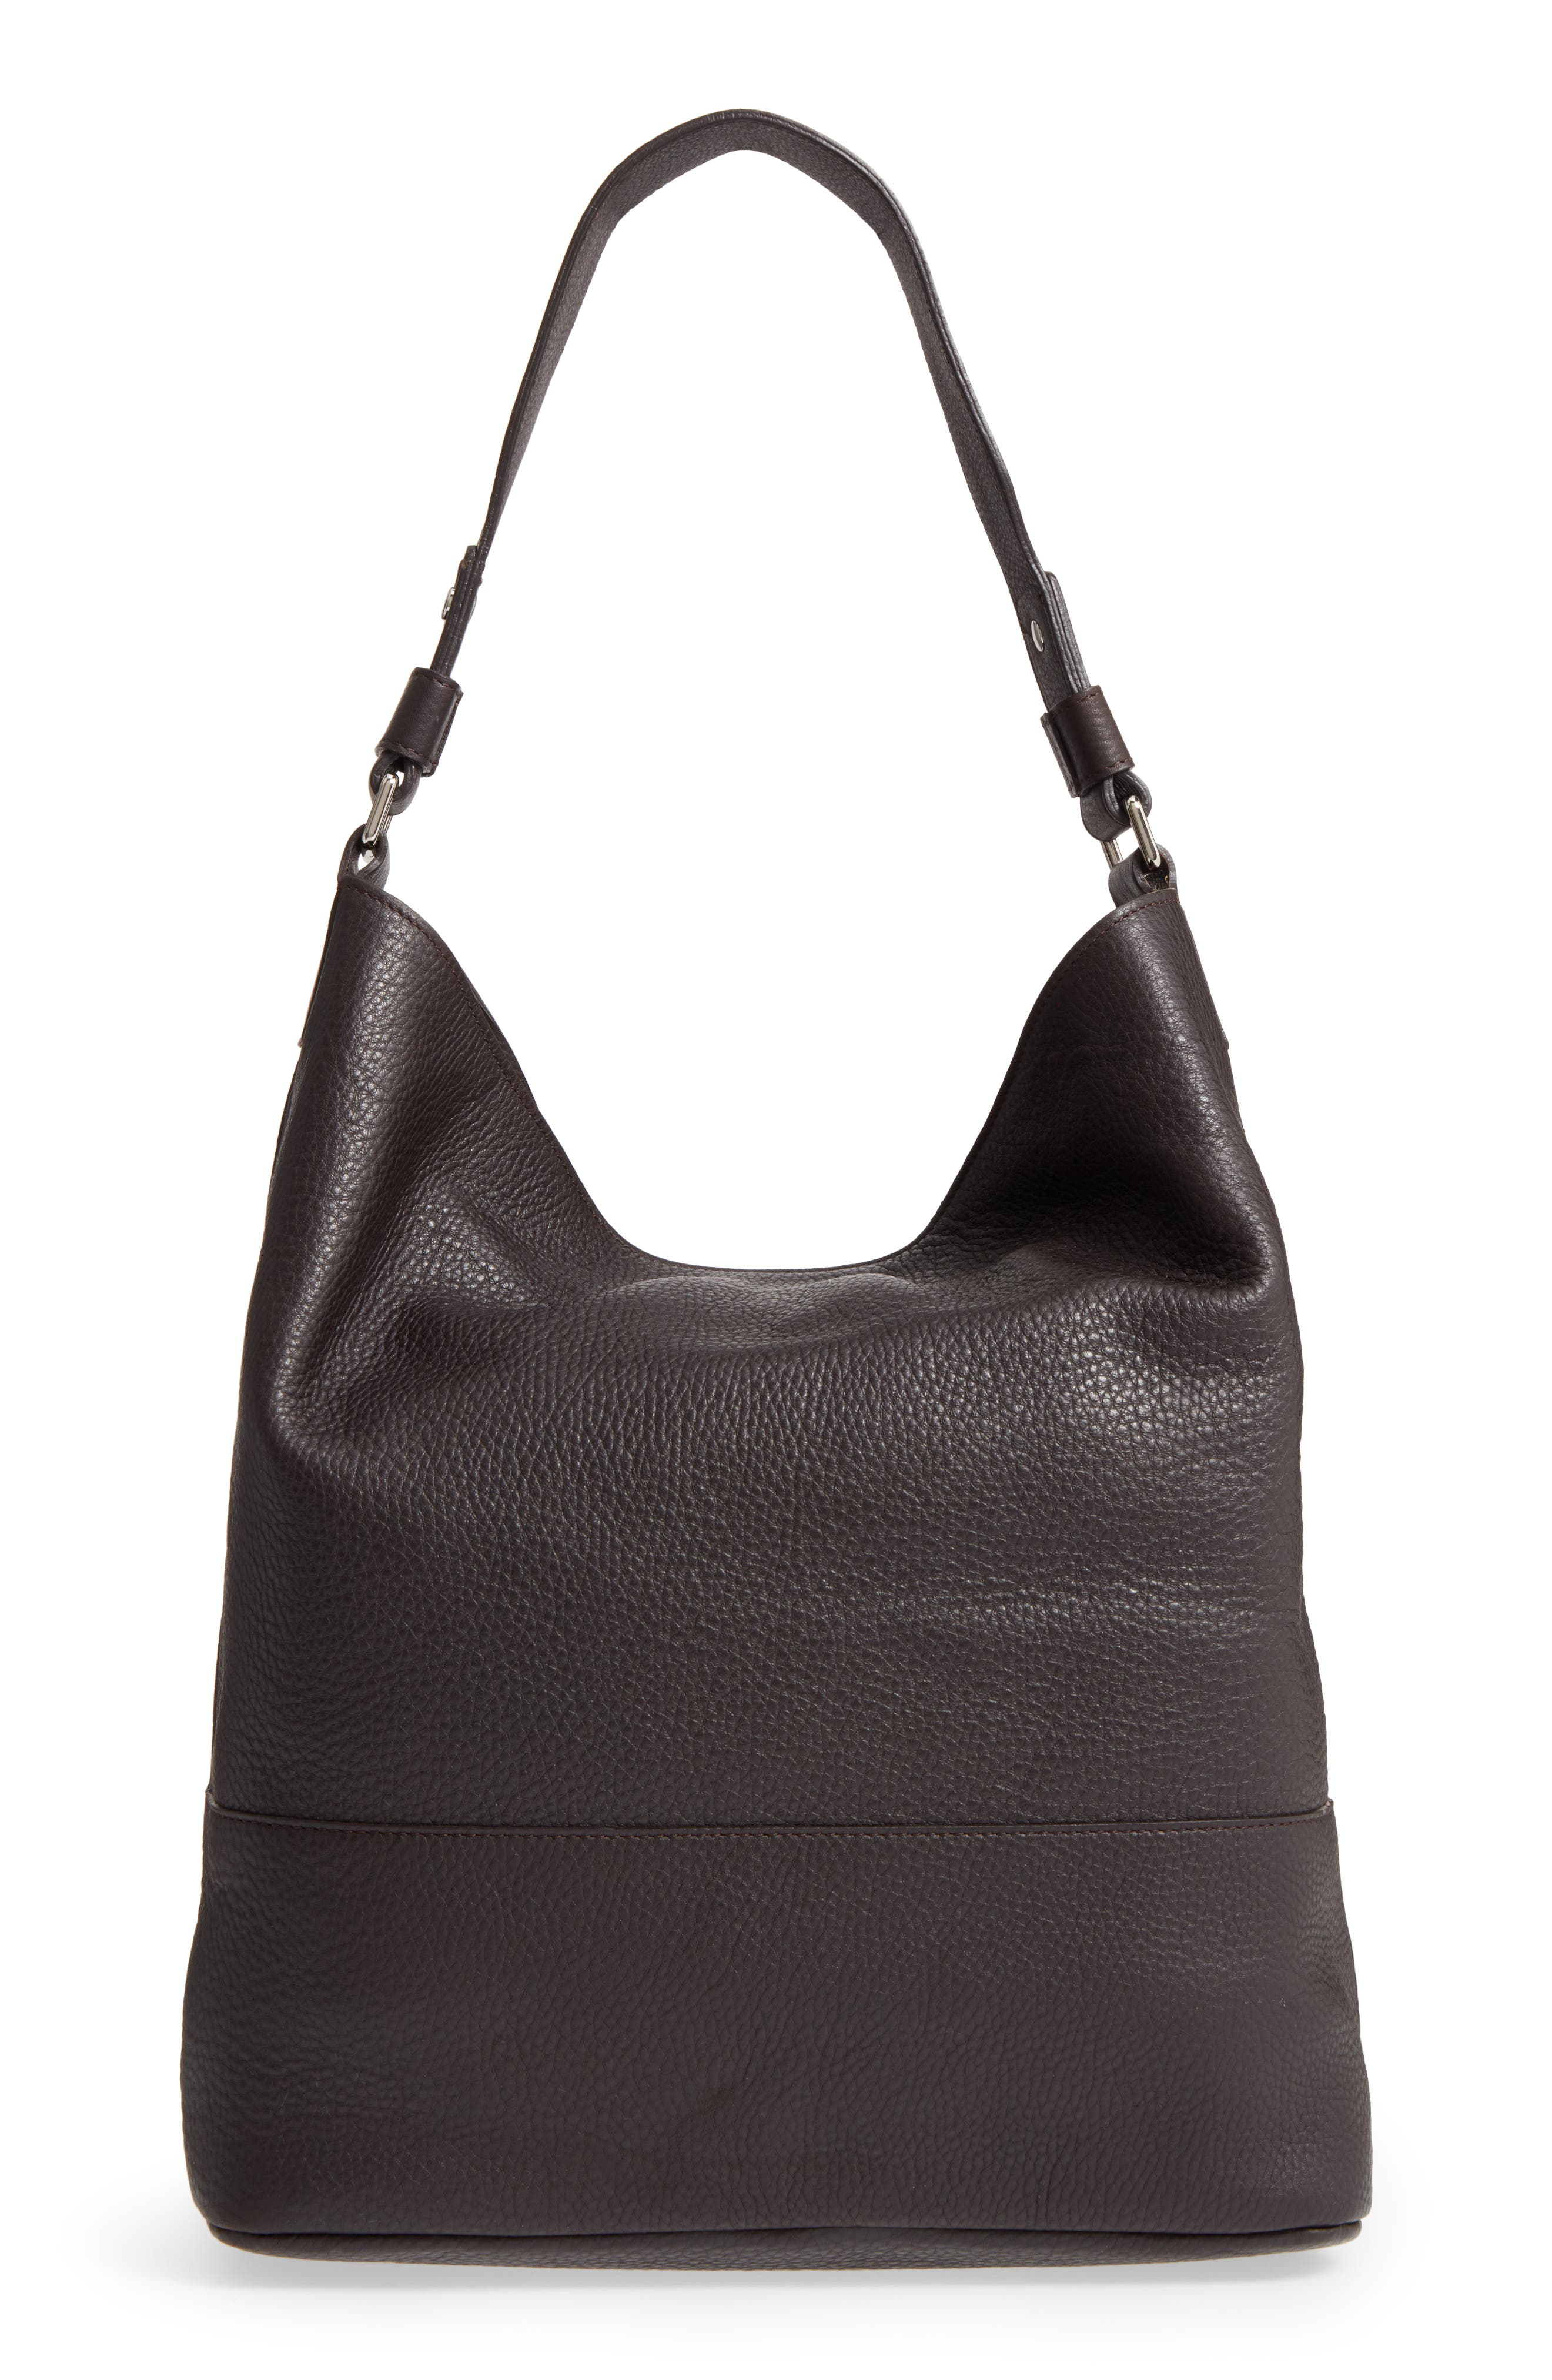 SHINOLA,                             Relaxed Calfskin Leather Hobo Bag,                             Alternate thumbnail 3, color,                             240